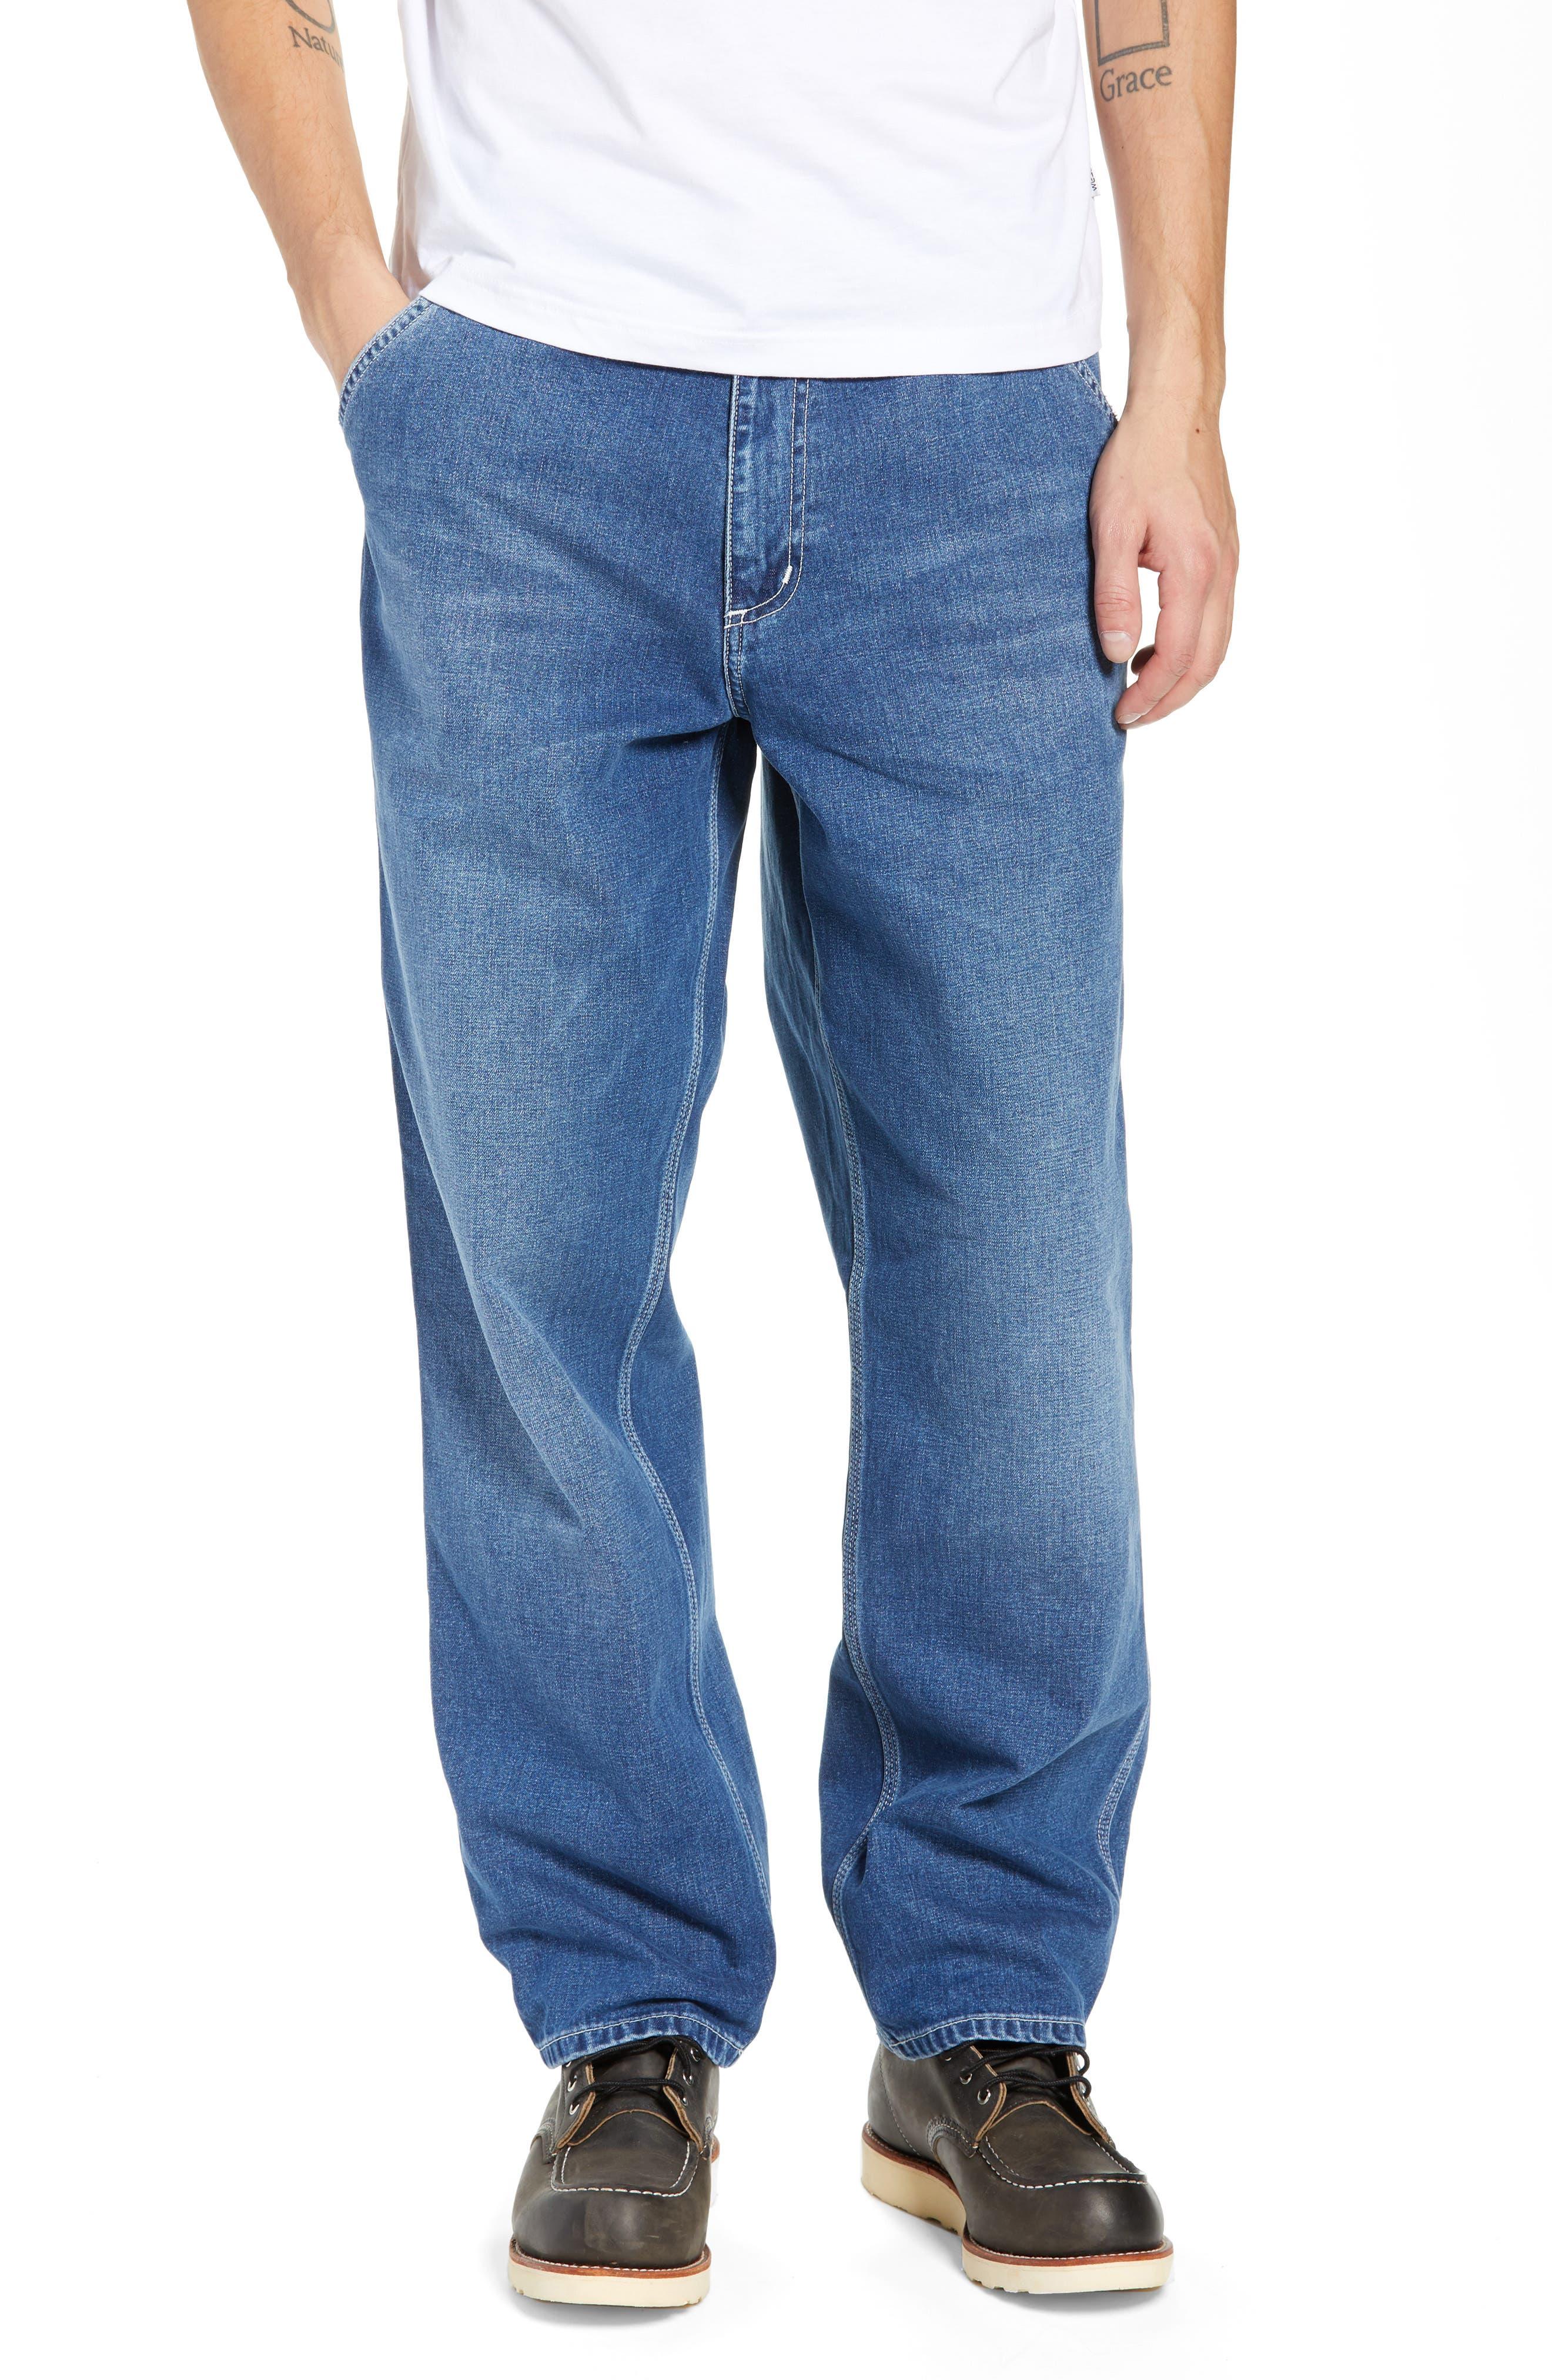 CARHARTT WORK IN PROGRESS Simple Denim Jeans, Main, color, BLUE